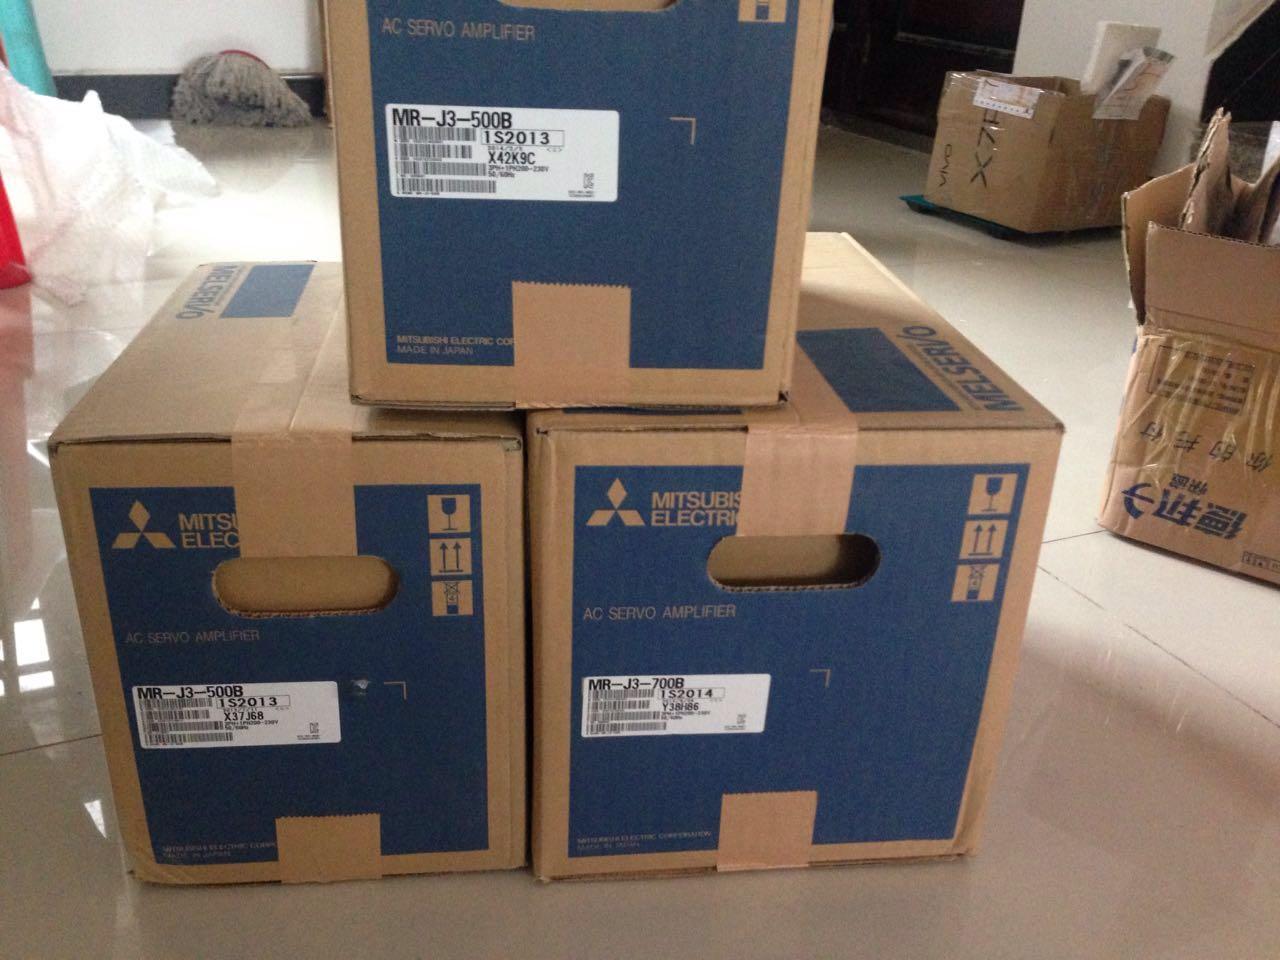 mr-j3-200a三菱伺服驱动器产品大图